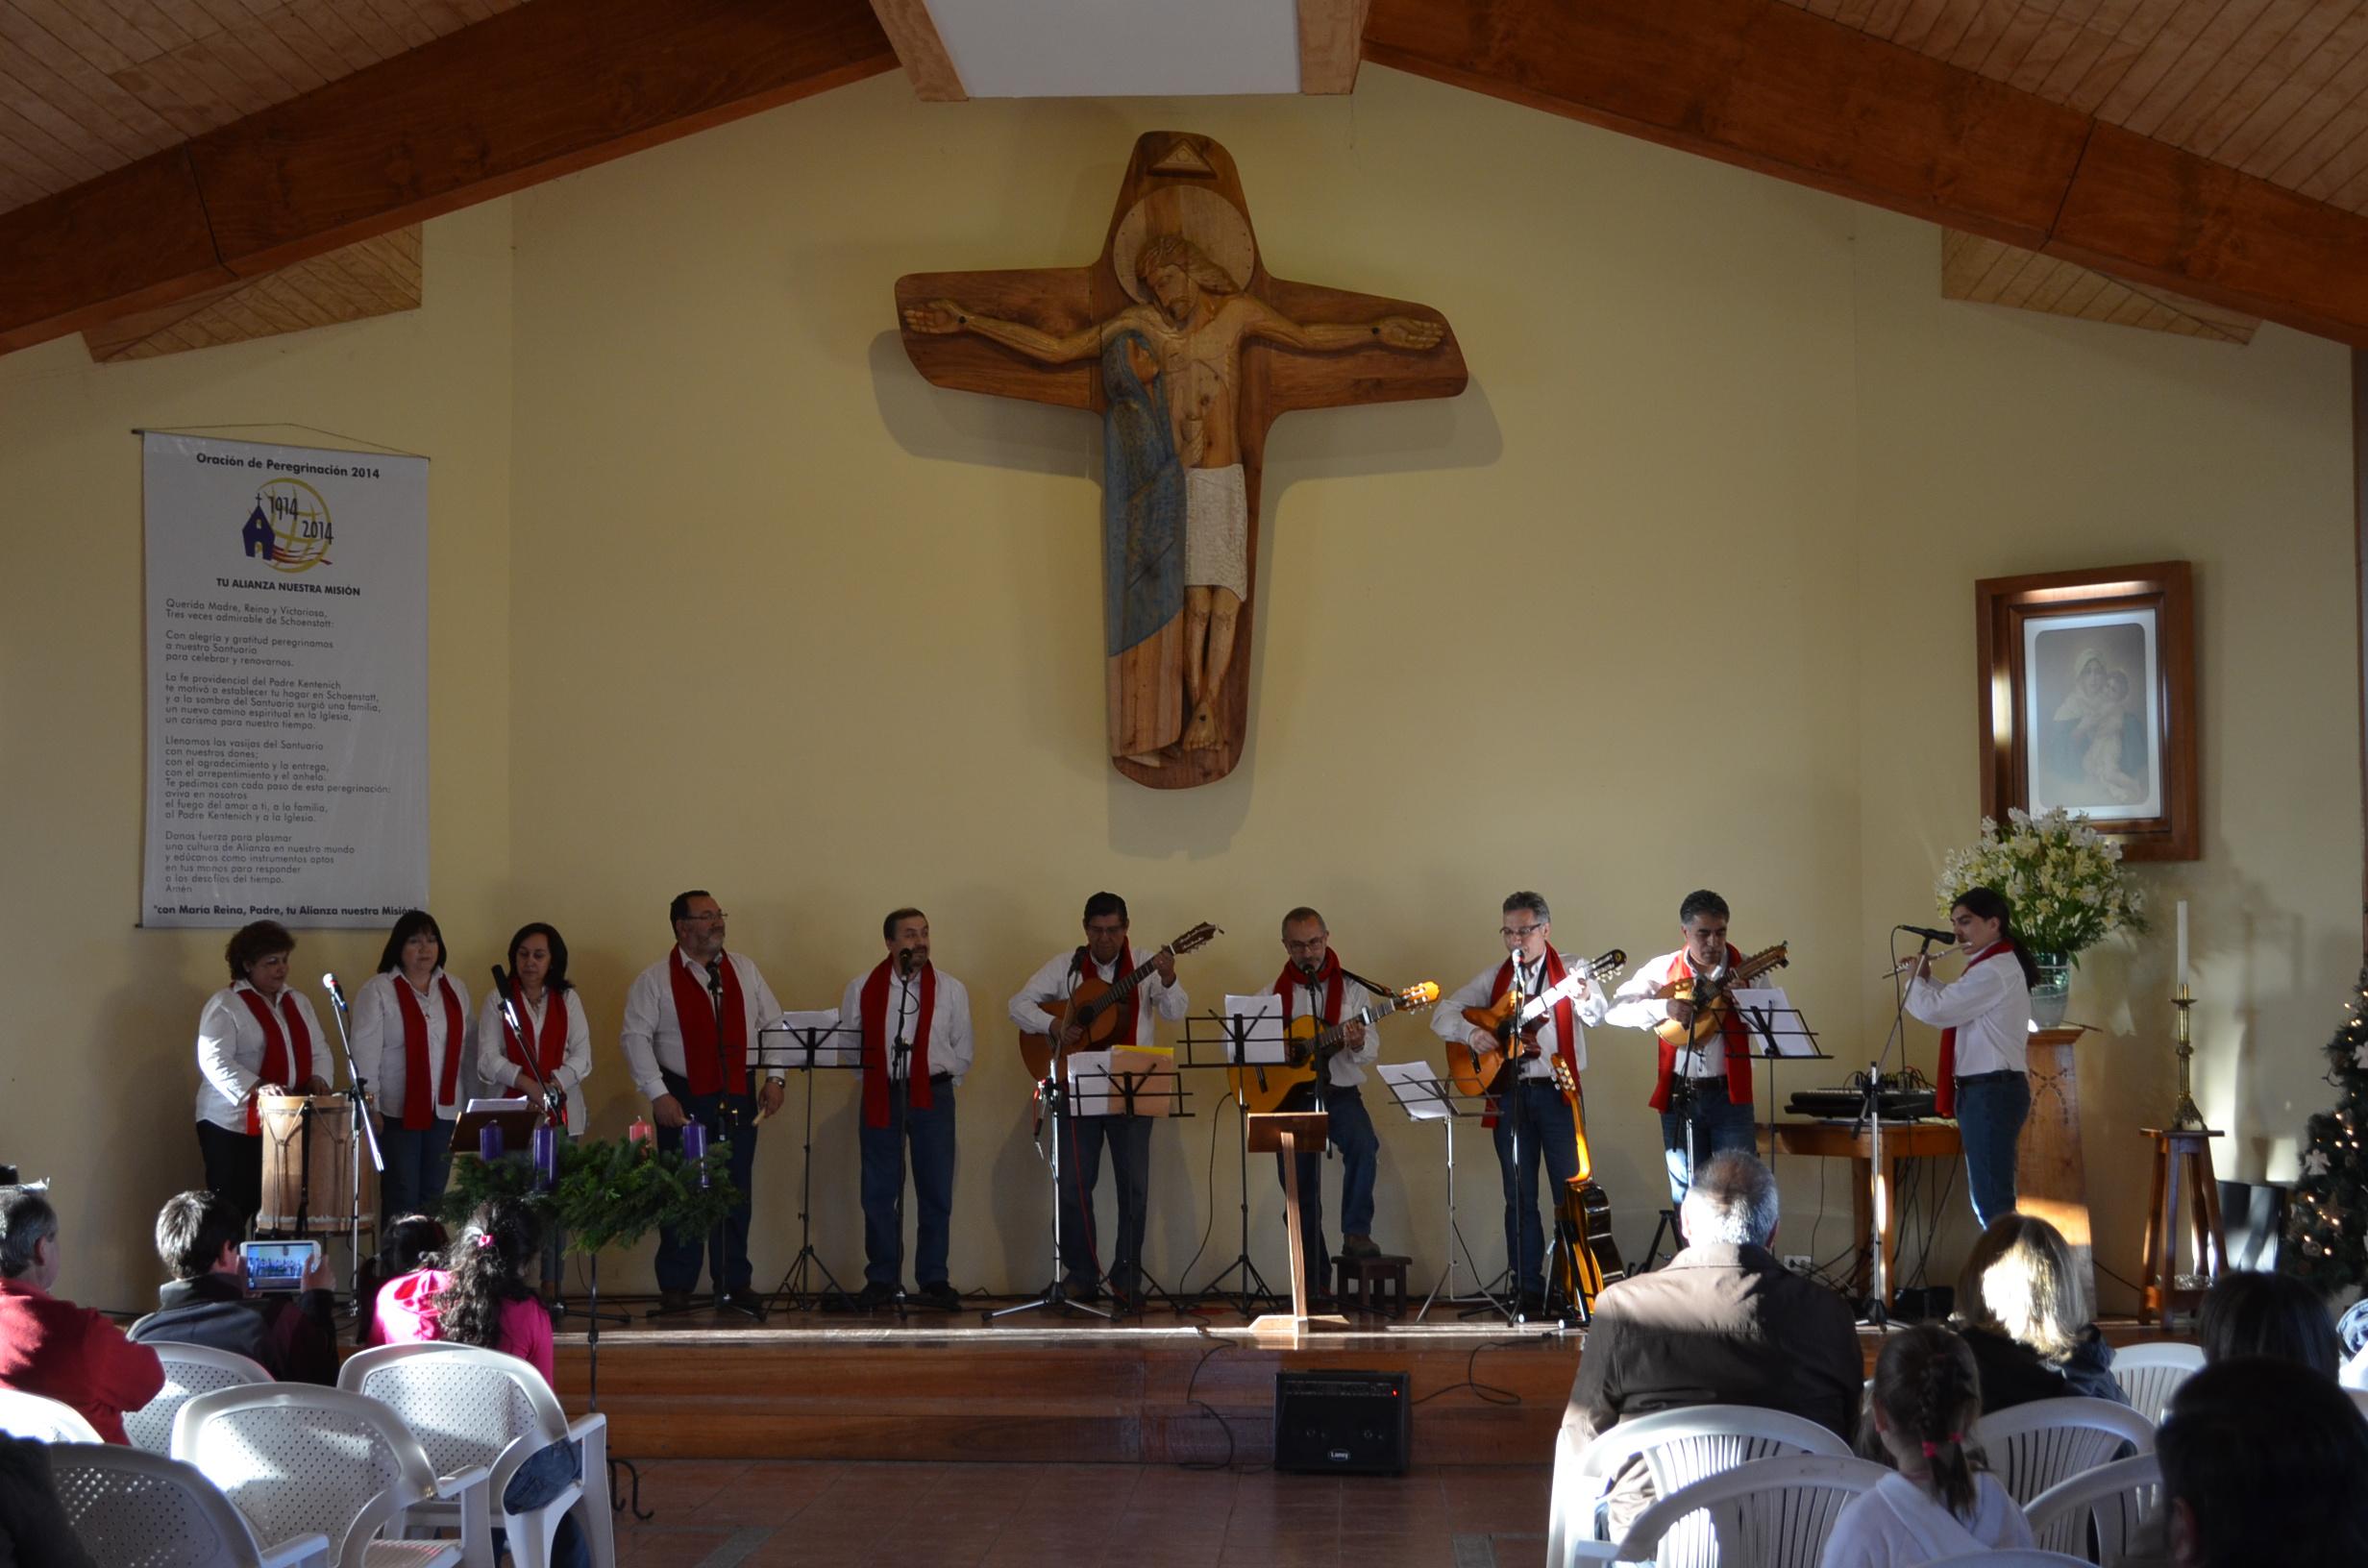 Cantata al Niño Jesús